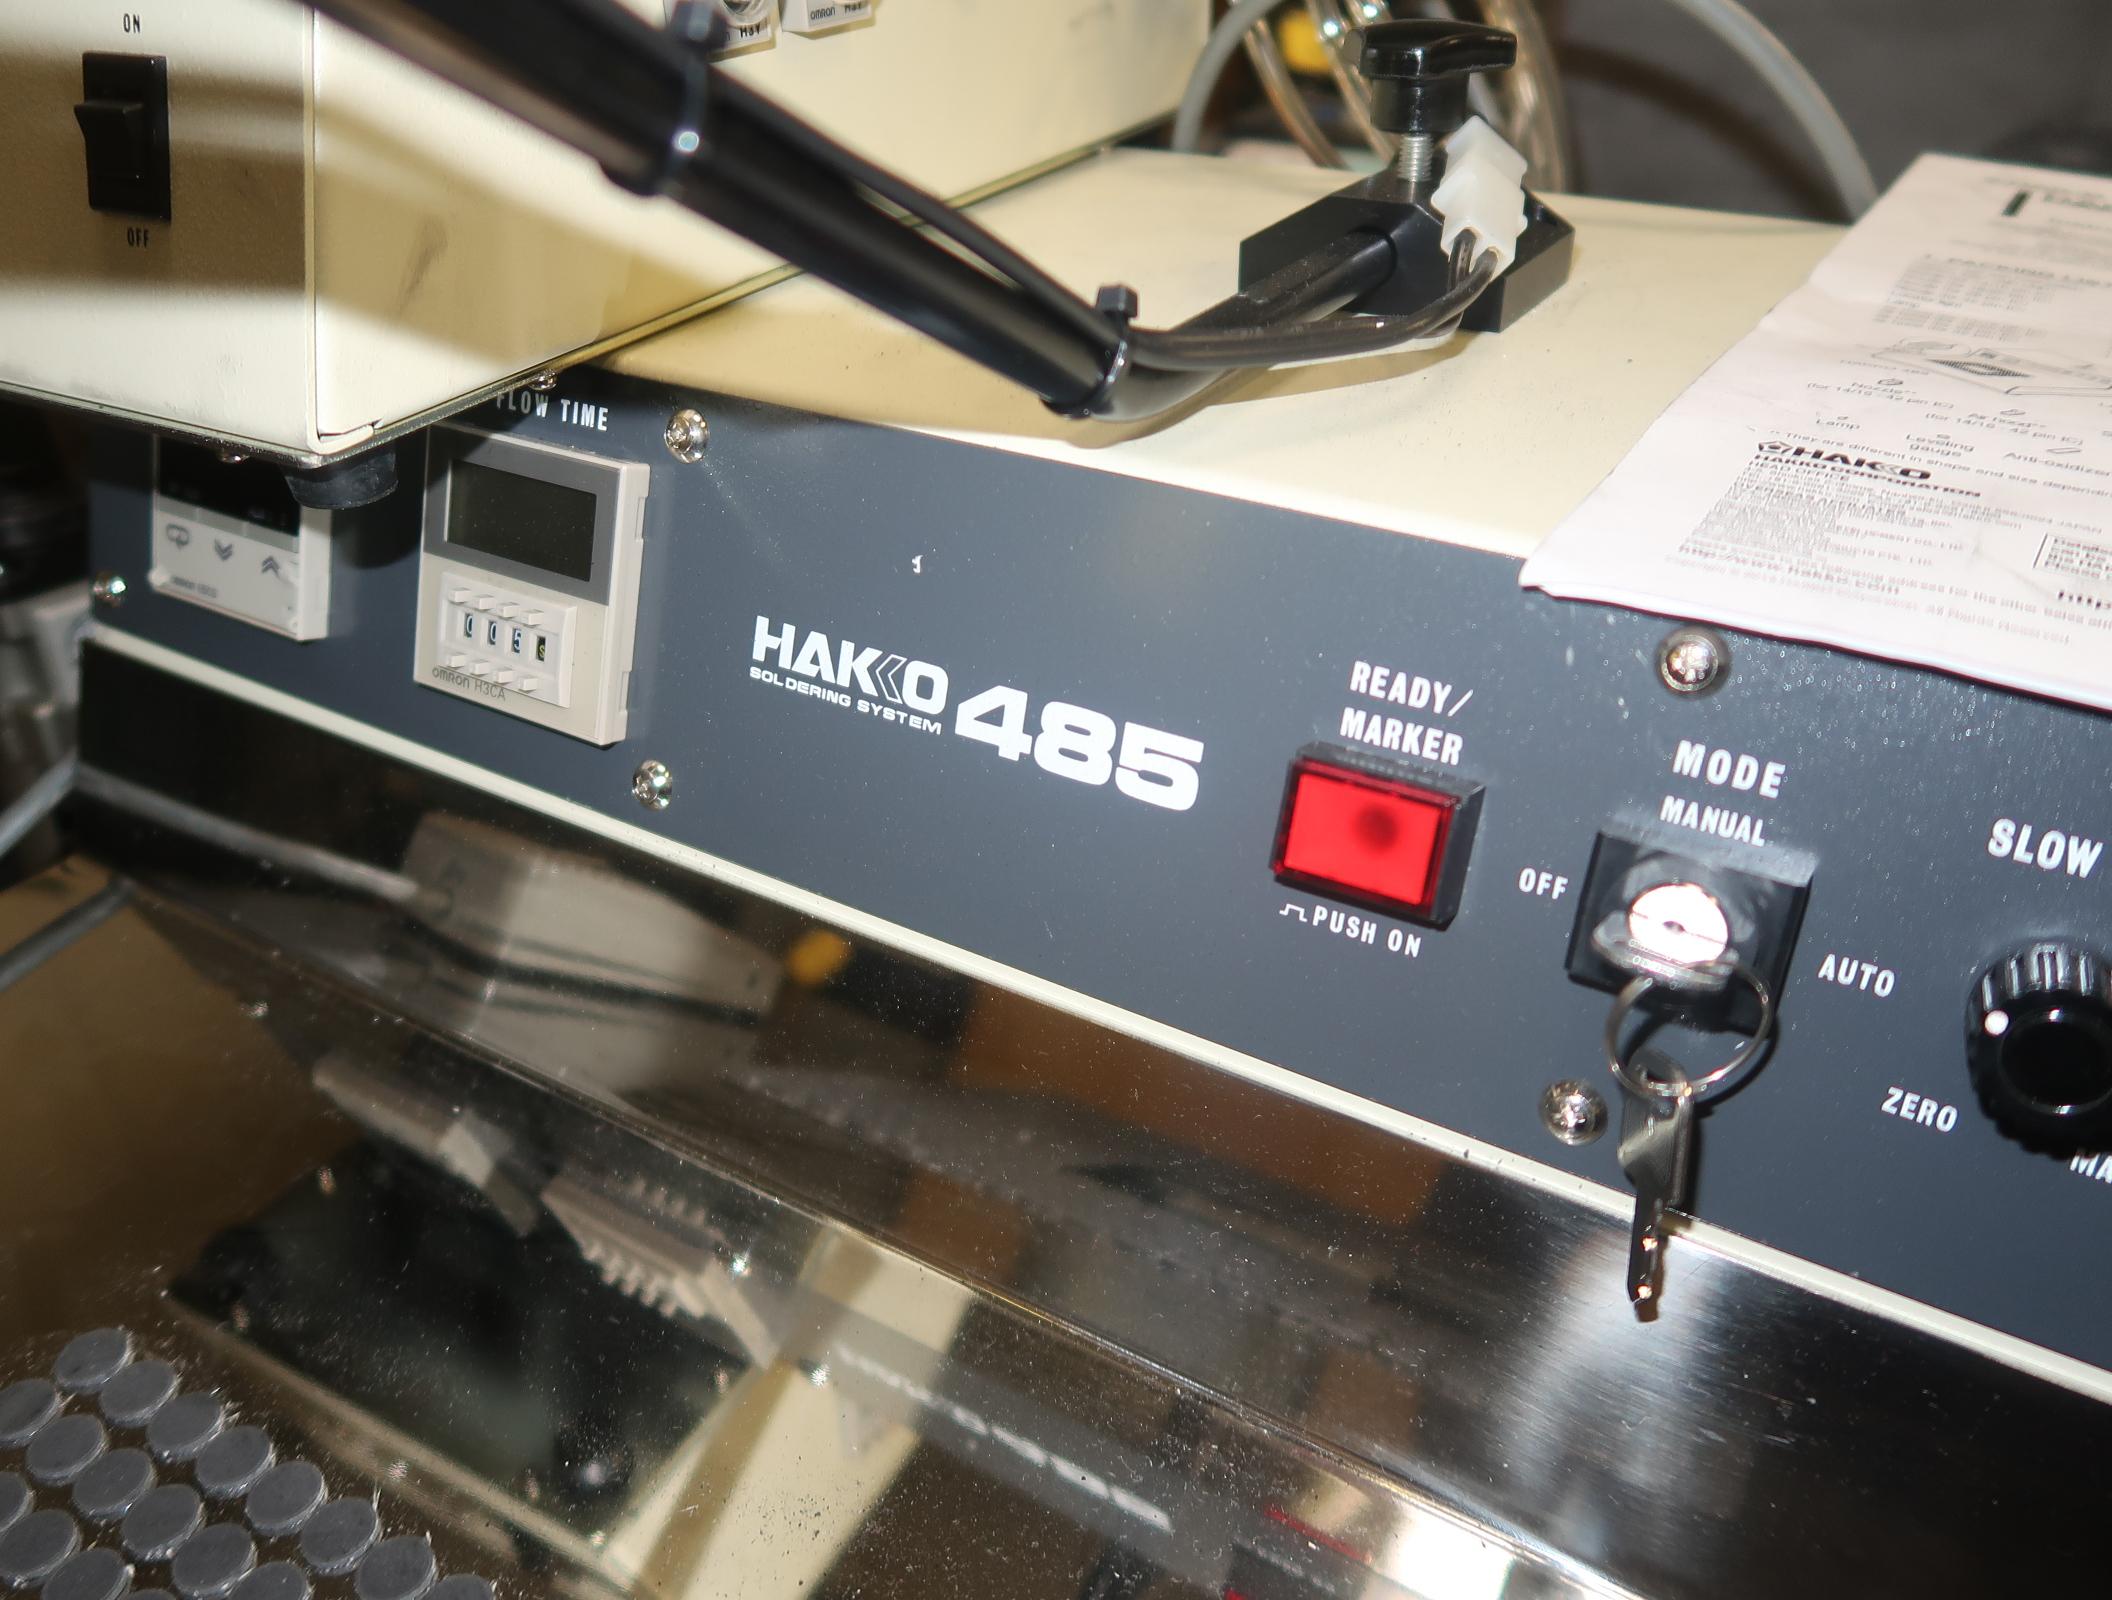 Lot 16 - HAKKO 485 SOLD MACHINE, MDL. 485-V12 SN. 01485019000002